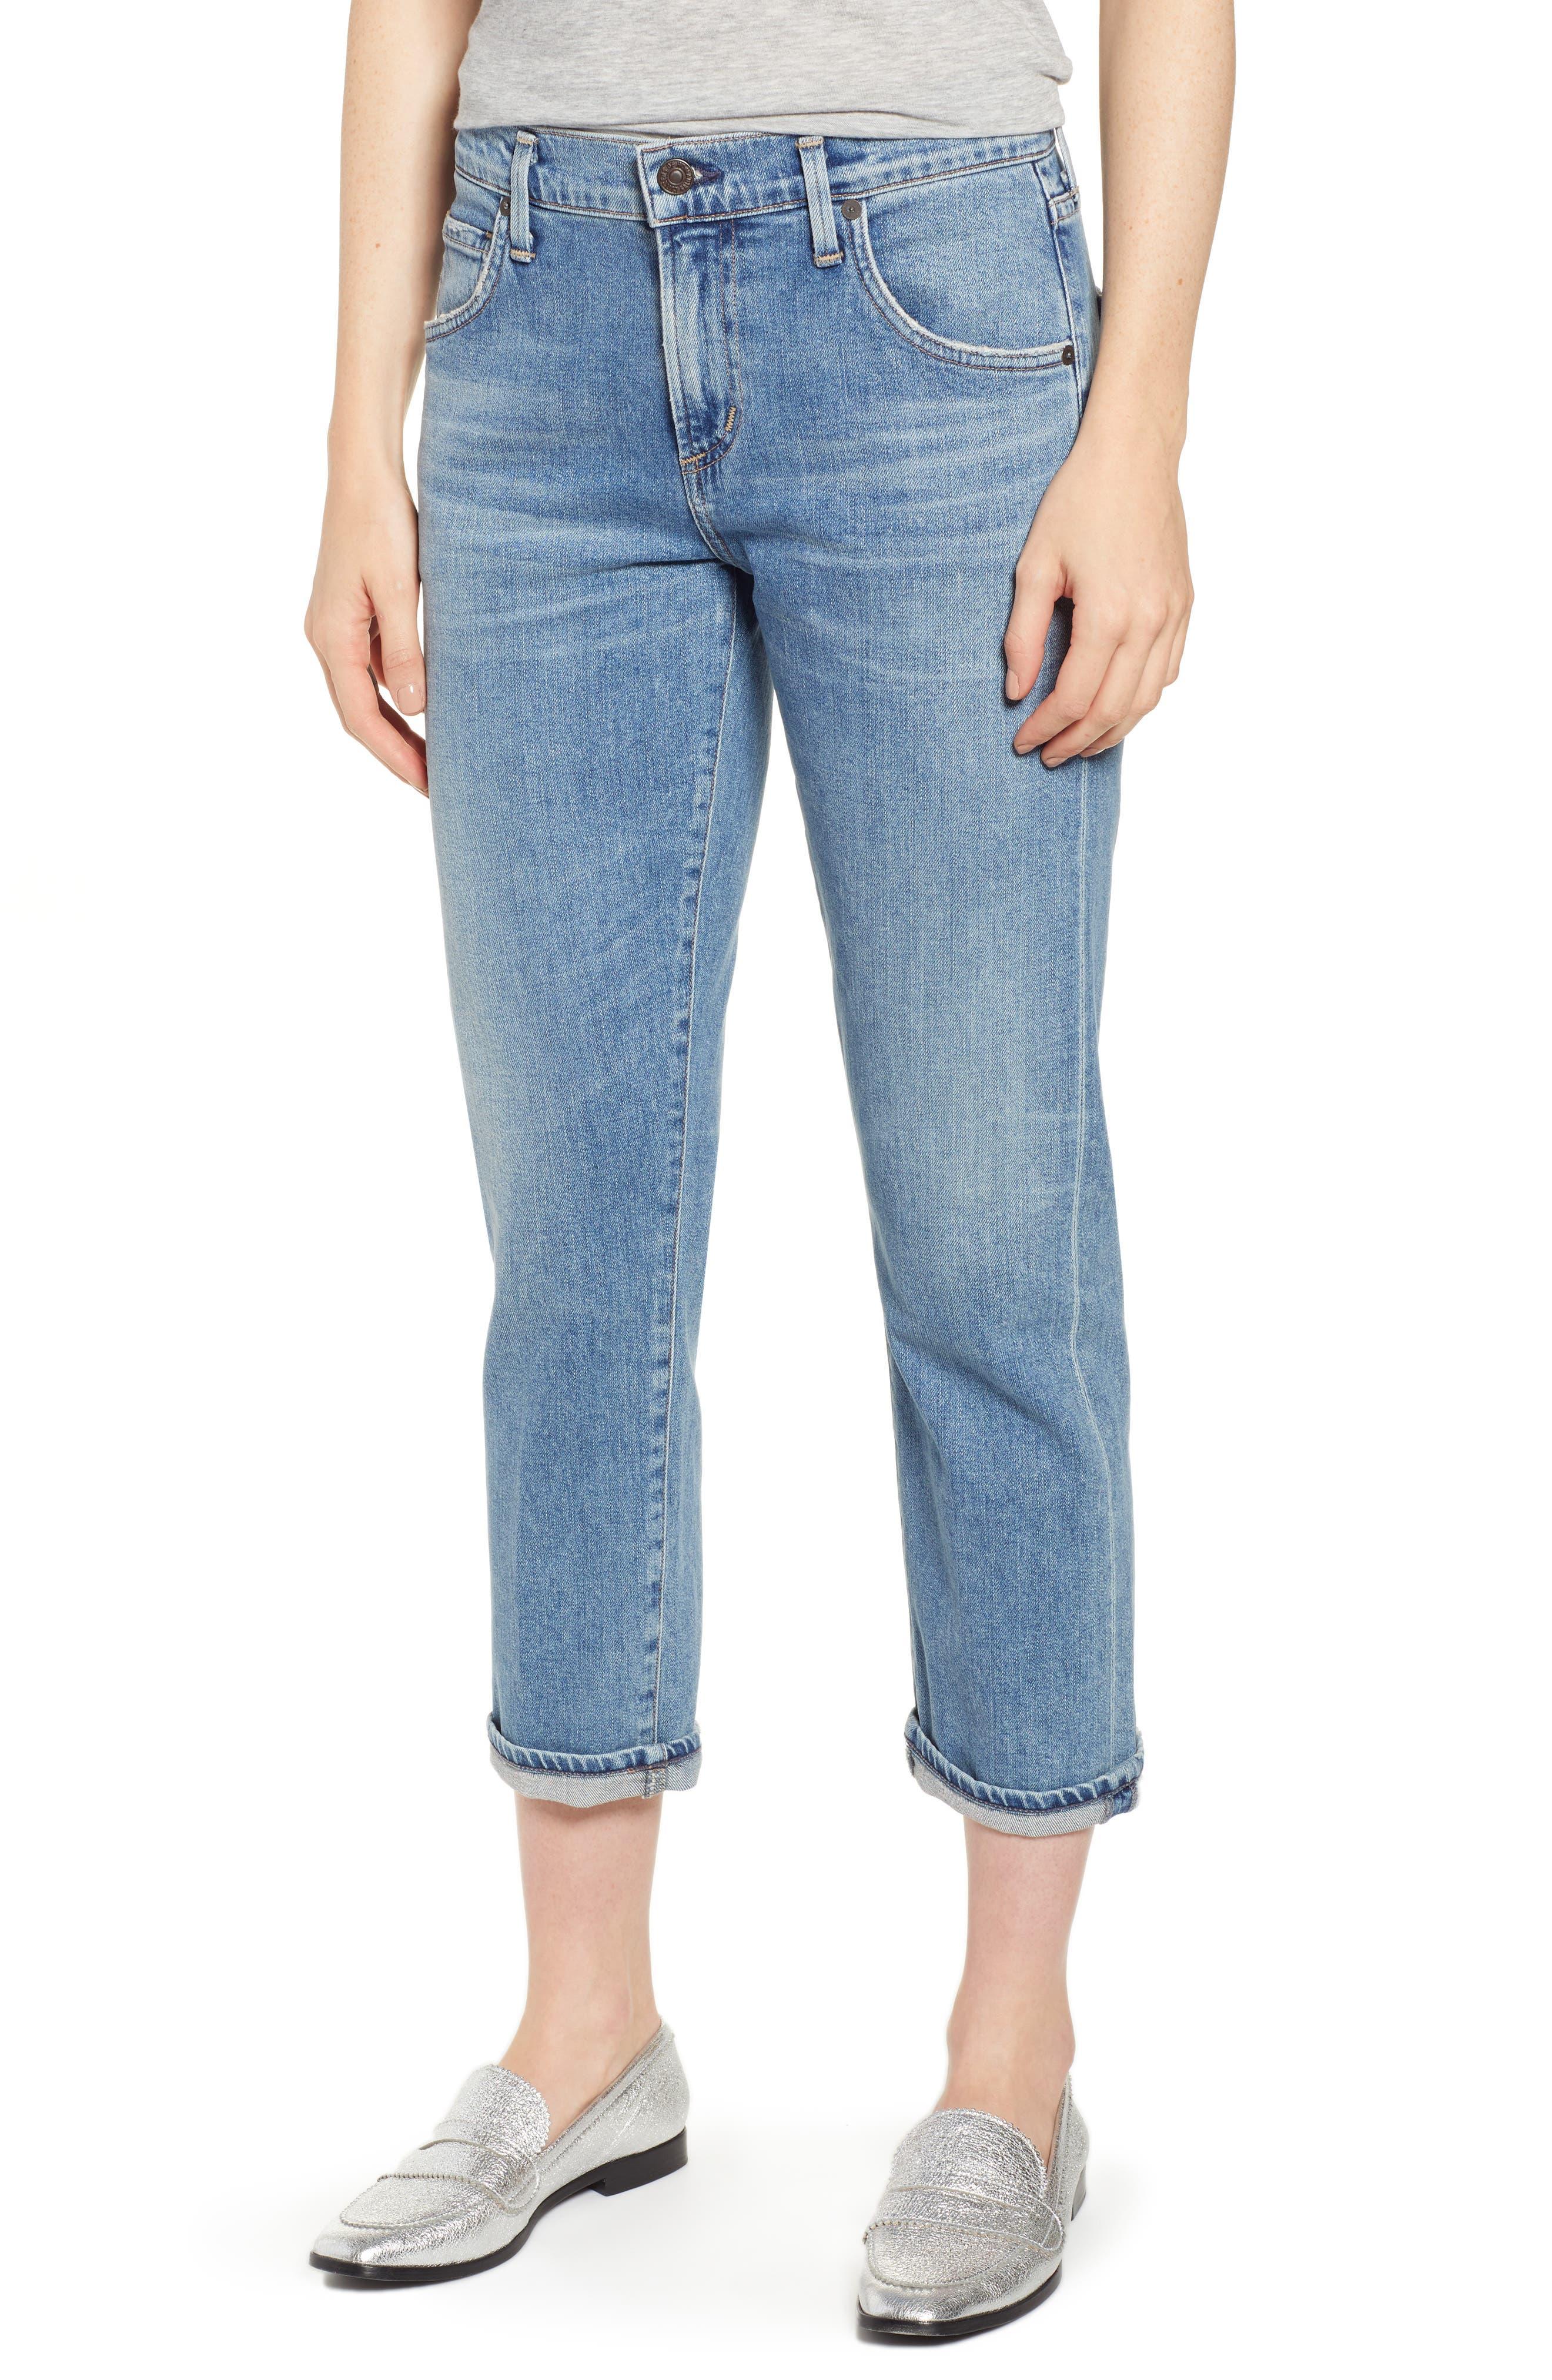 CITIZENS OF HUMANITY Emerson Ankle Boyfriend Jeans, Main, color, ENCORE